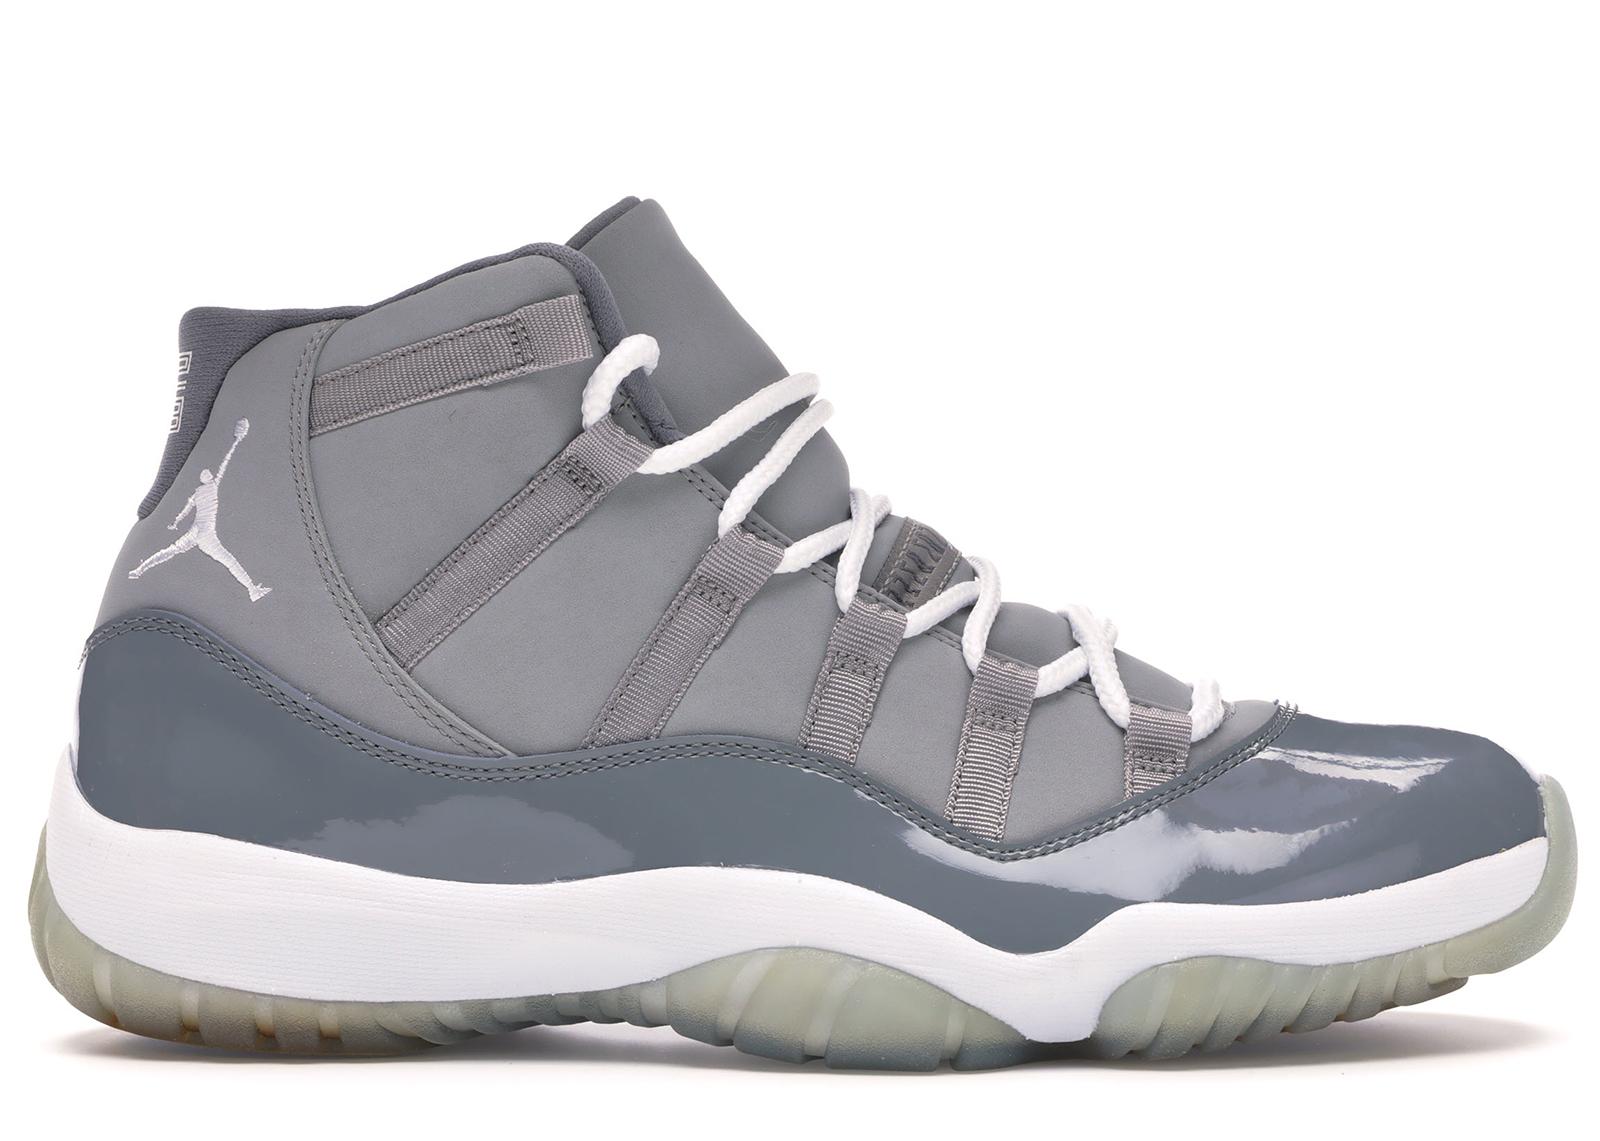 Jordan 11 Retro Cool Grey (2010